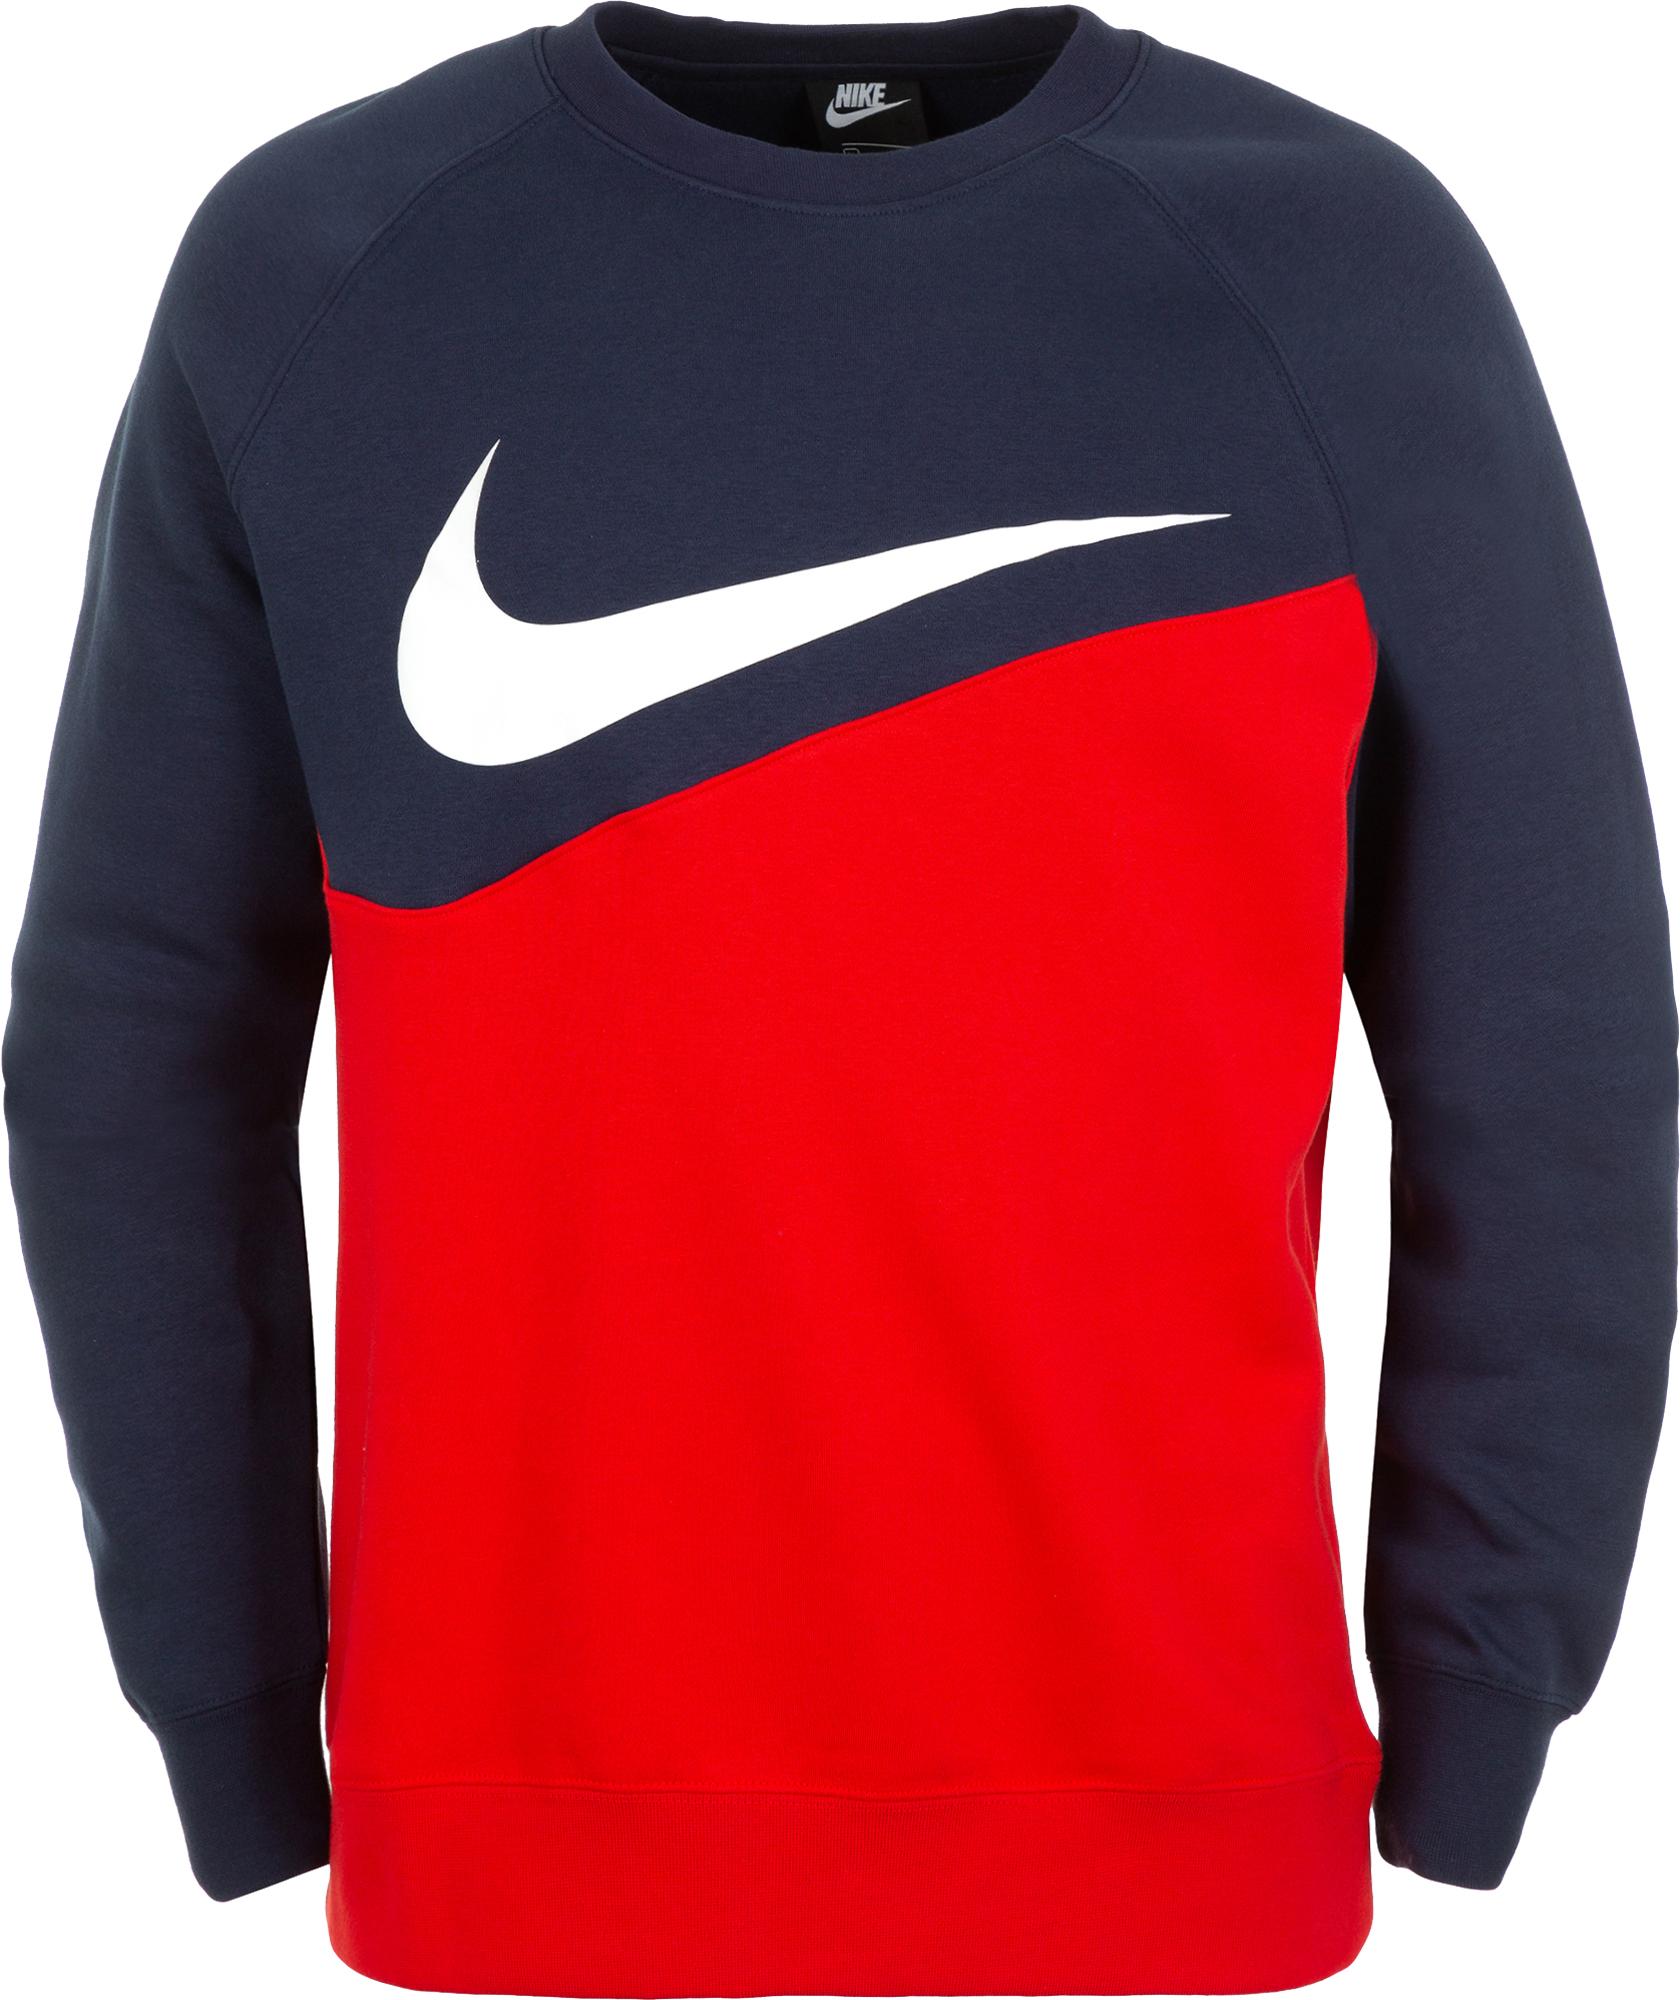 Nike Свитшот мужской Nike Swoosh Crew, размер 52-54 цены онлайн